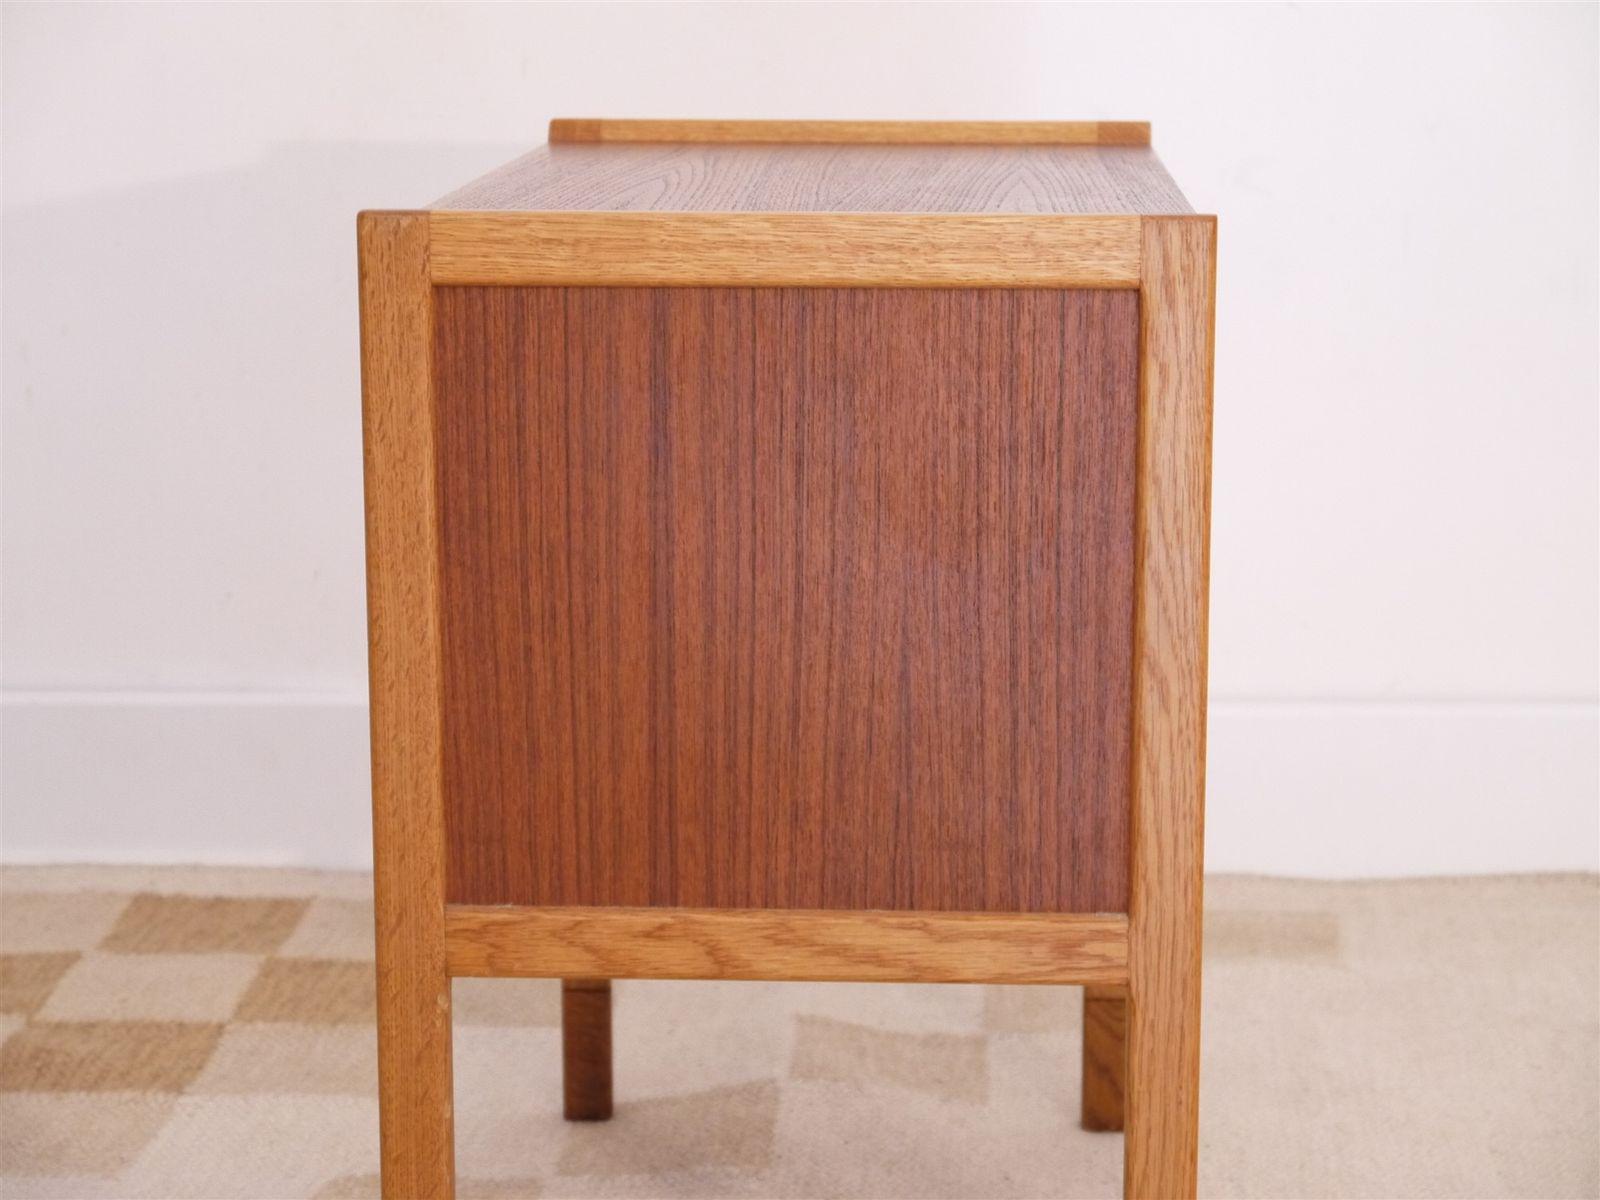 Skandinavische Möbel Sale Skandinavischer Sessel Aus Bugholz Und